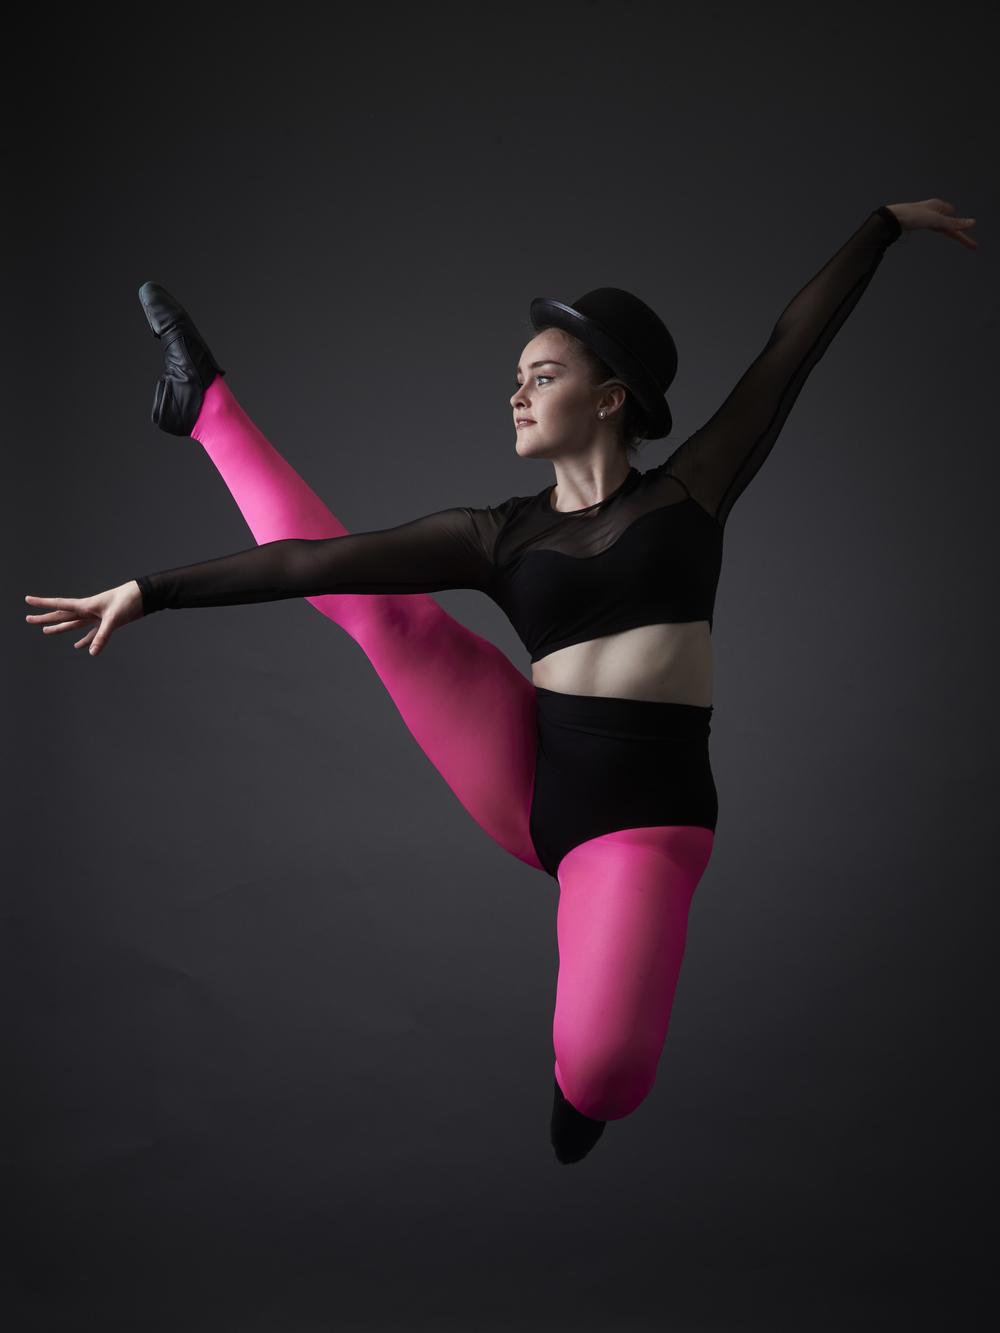 FotoFun Elise Phillipi Ballet_DSC2869_PSD_HR.jpg